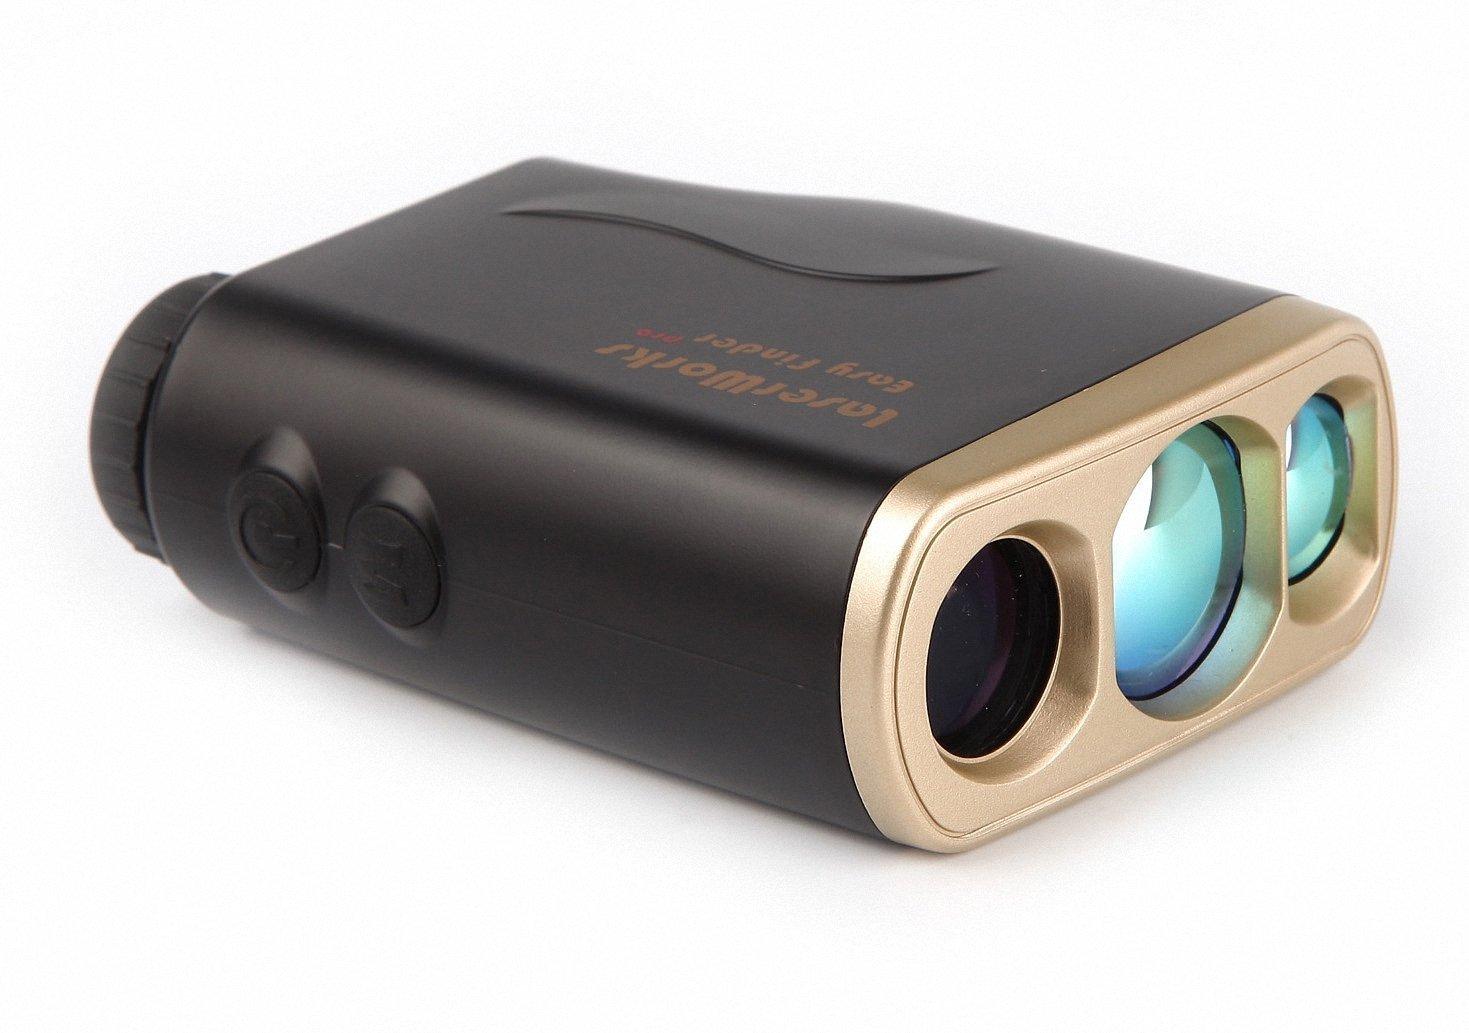 Entfernungsmesser Jagd Mit Beleuchtung : Golf entfernungsmesser wasserdichtes amazon kamera